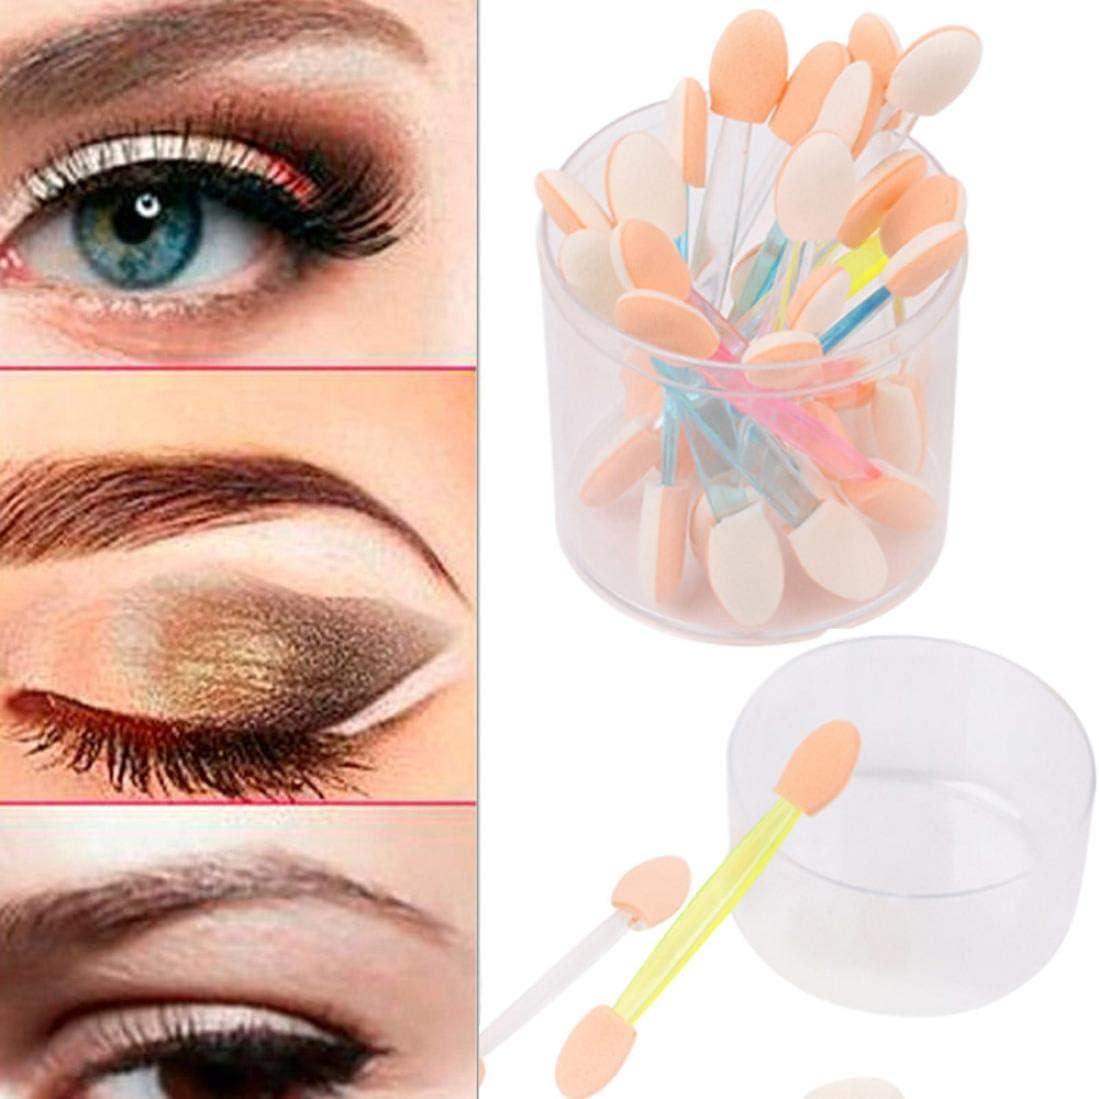 24 doble cabeza cepillo para sombra de ojos maquillaje doble Fin cepillo para sombra de ojos Eyeliner herramienta de aplicación de esponja sunshineboby: Amazon.es: Belleza